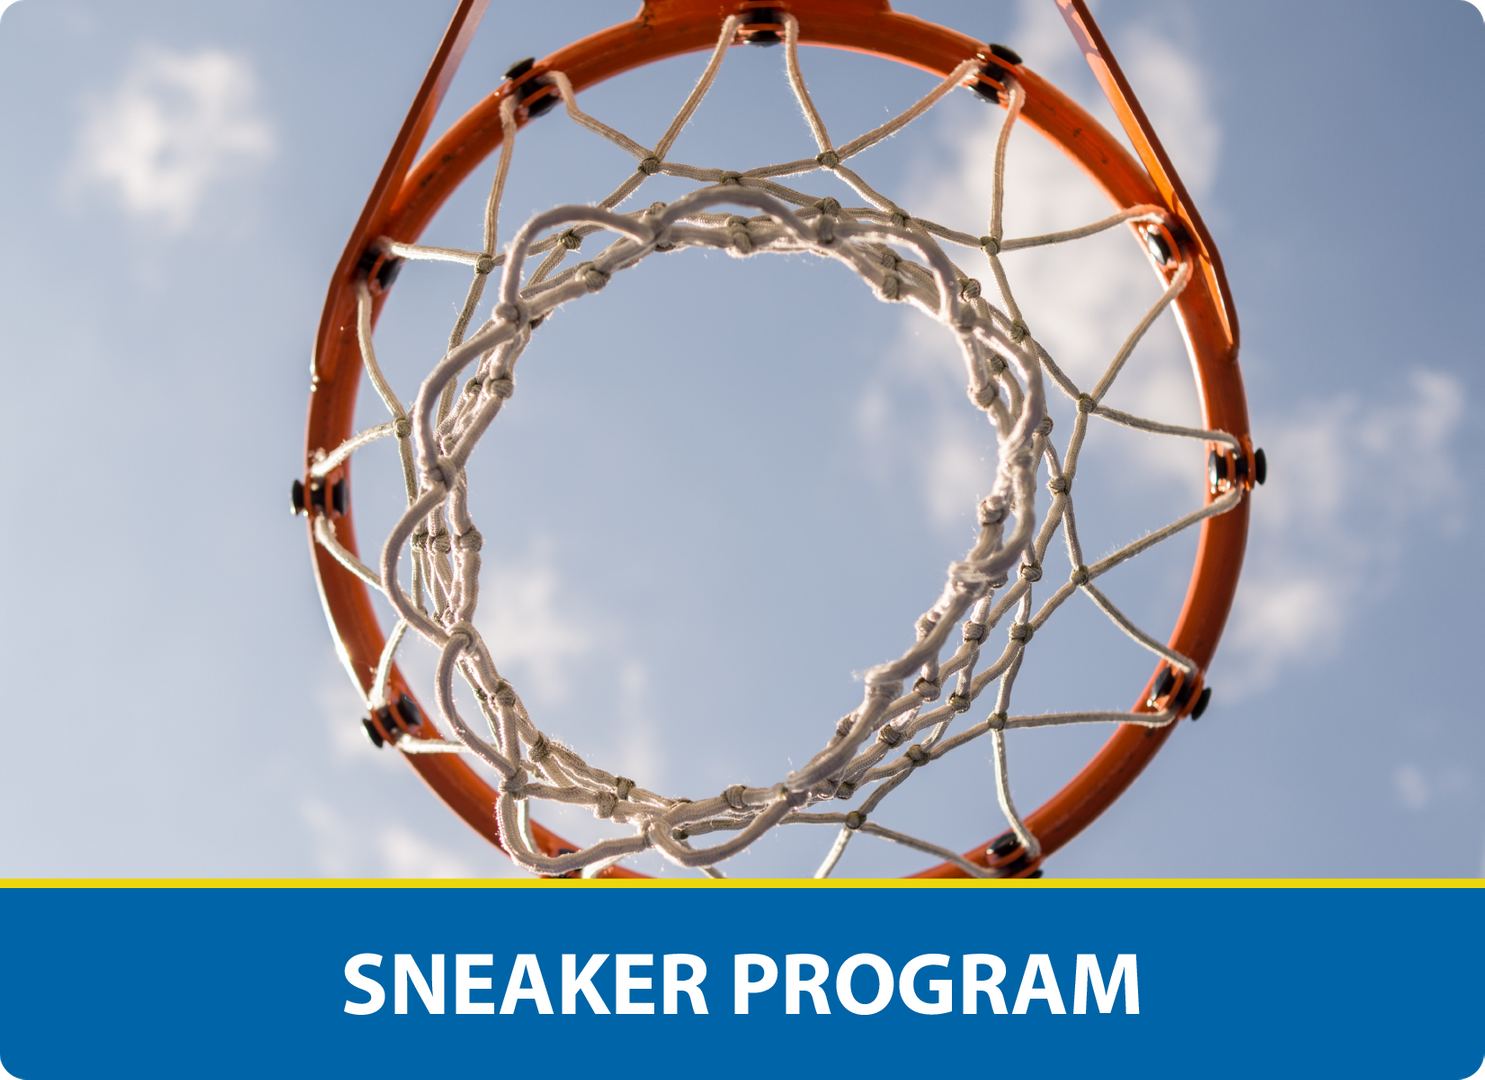 Sneaker Program: Basketball hoop